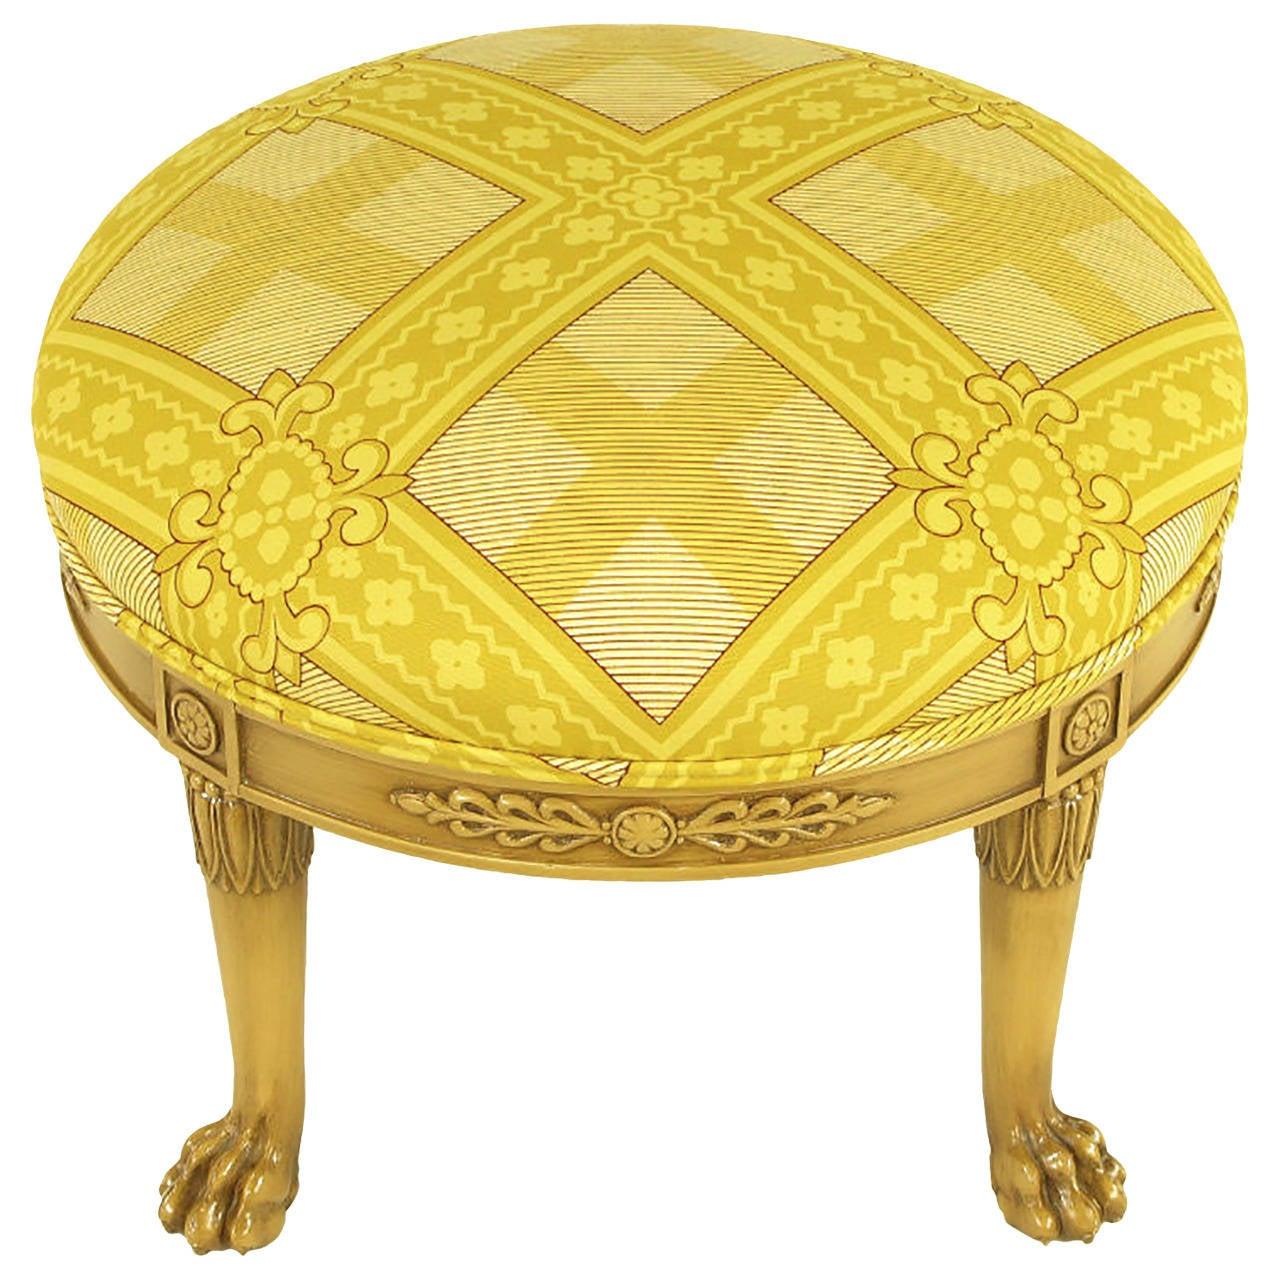 Ottomans Ornate Mahogany Ottoman: Round Lion's Paw Glazed Mahogany And Saffron Silk Empire